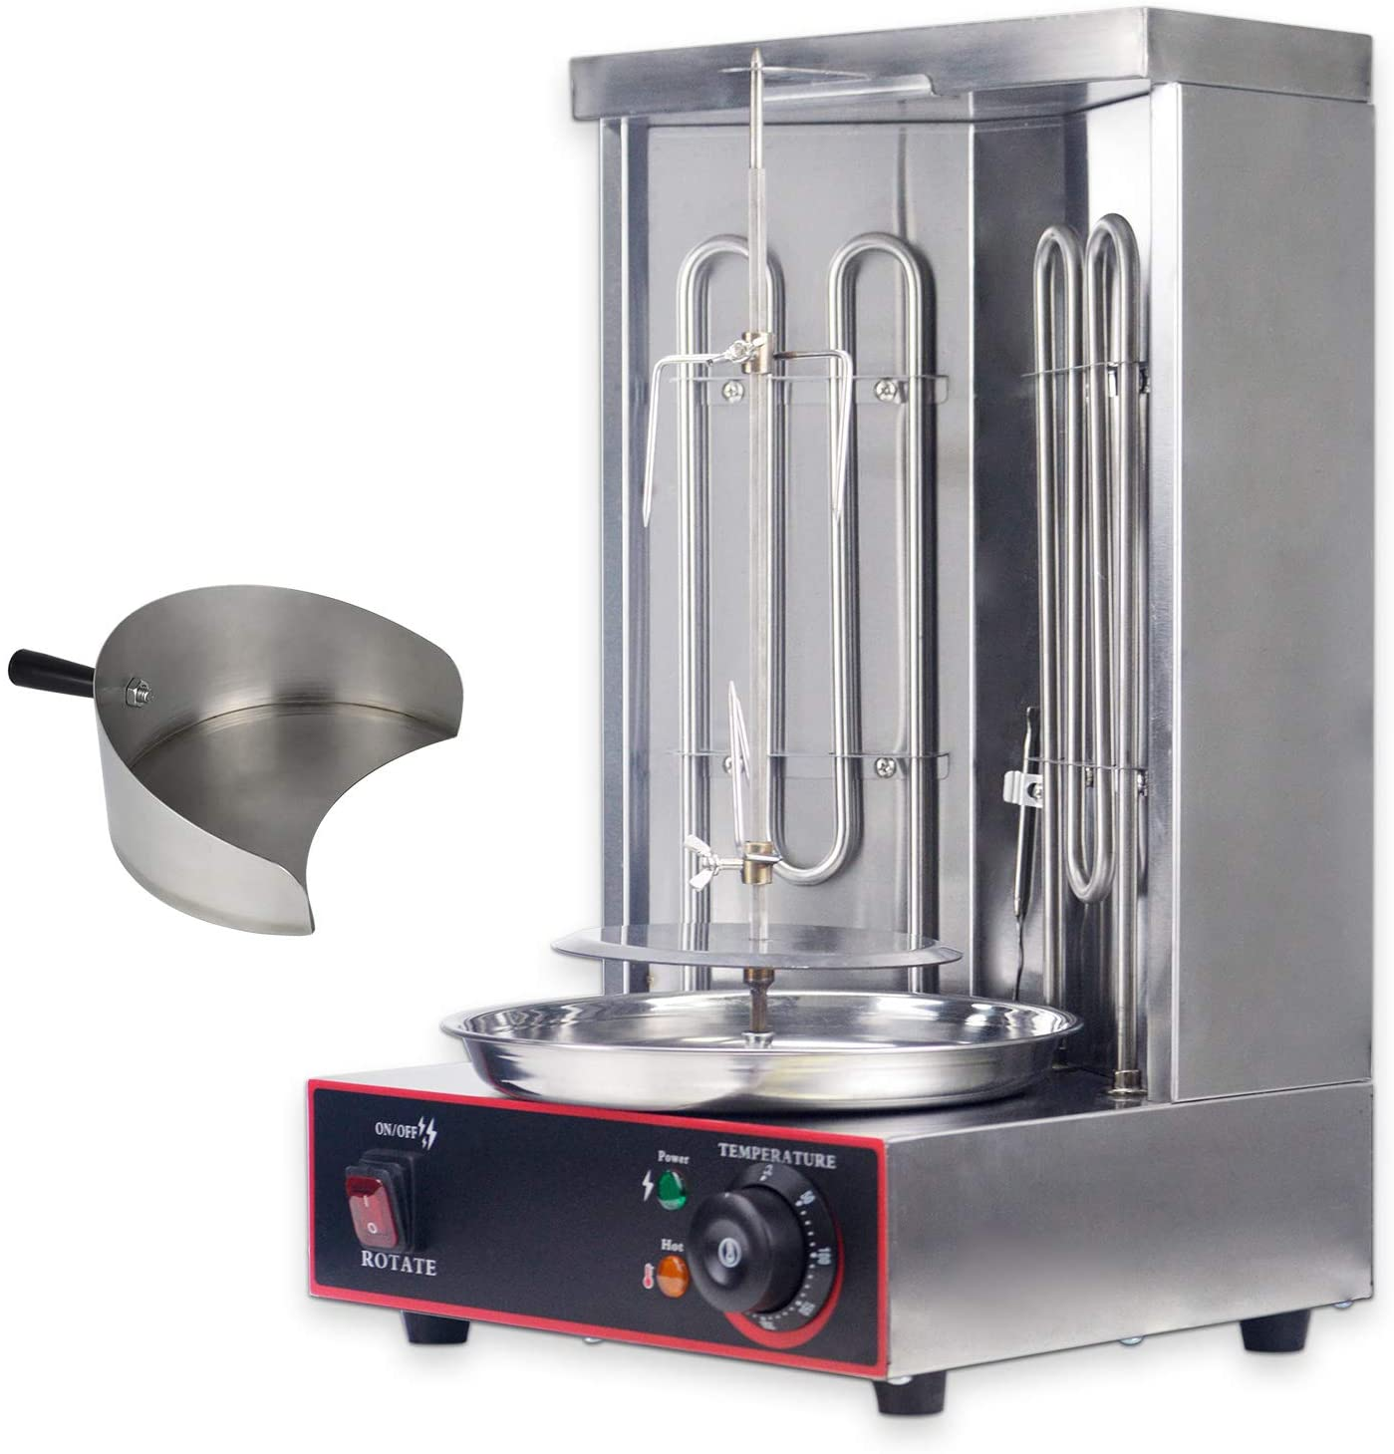 Nippon regular agency YOOYIST Electric Vertical Broiler Max 78% OFF Shawarma Doner Gyro Kebab Gril